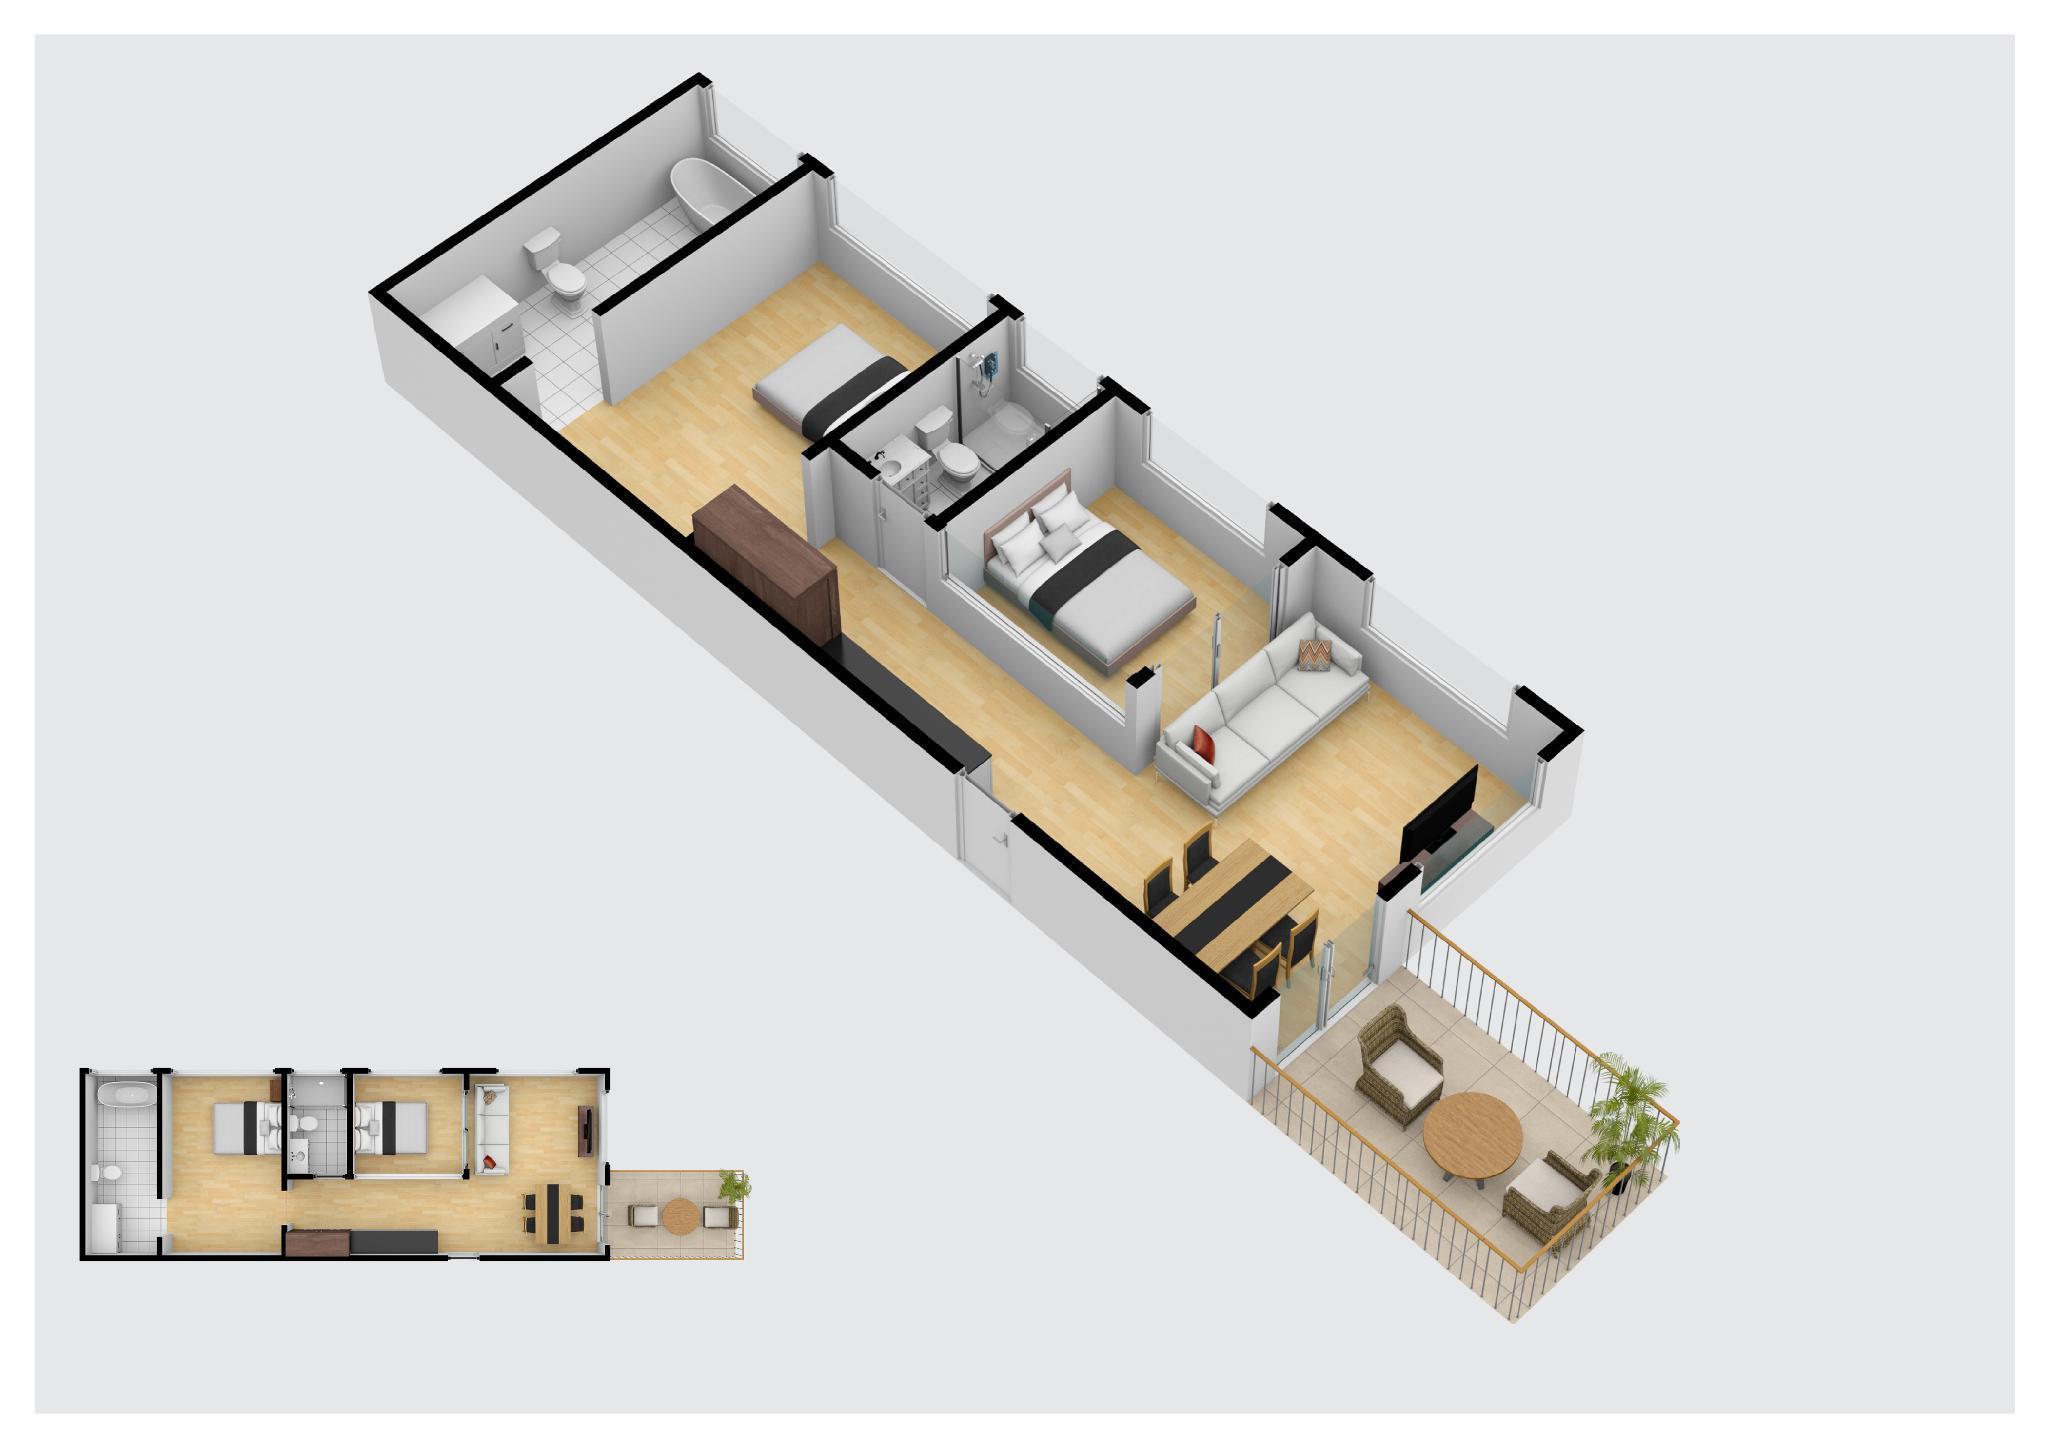 [2BR] Super cozy | Patong Beach,Phuket อพาร์ตเมนต์ 2 ห้องนอน 1 ห้องน้ำส่วนตัว ขนาด 50 ตร.ม. – ป่าตอง